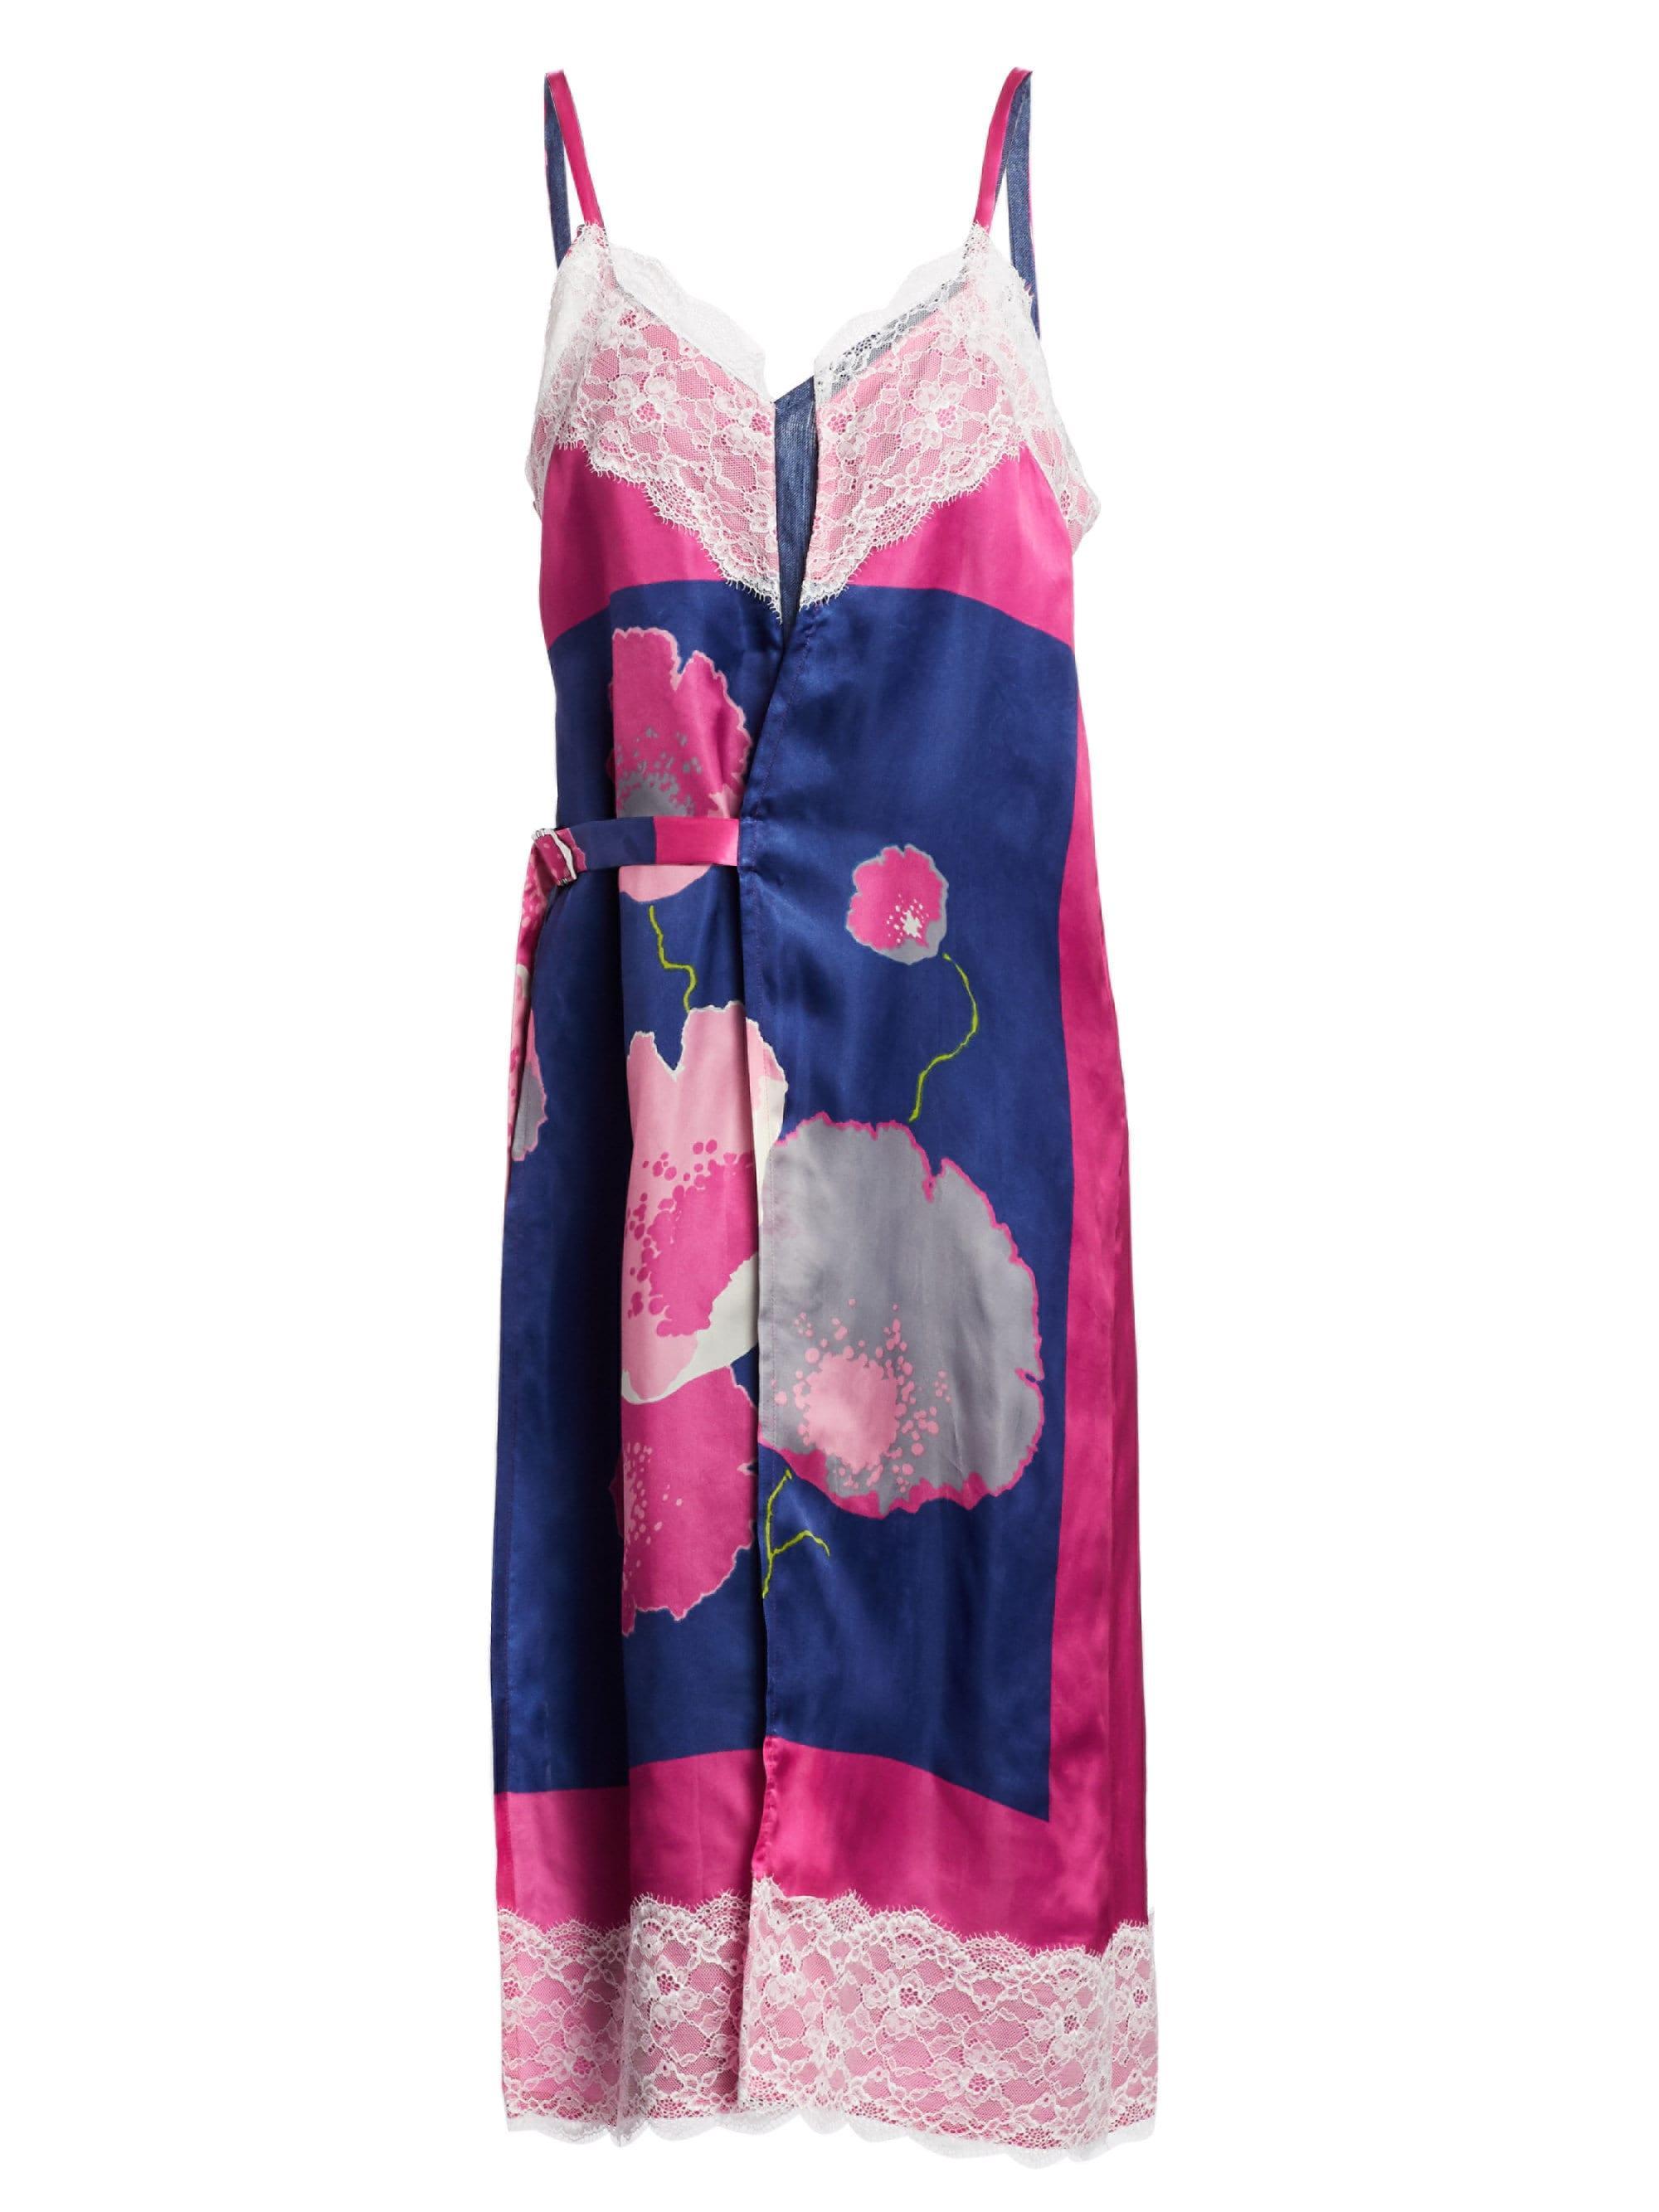 66995346af5 Lyst - Junya Watanabe Women s Floral Lace Belted Slip Dress - Navy ...